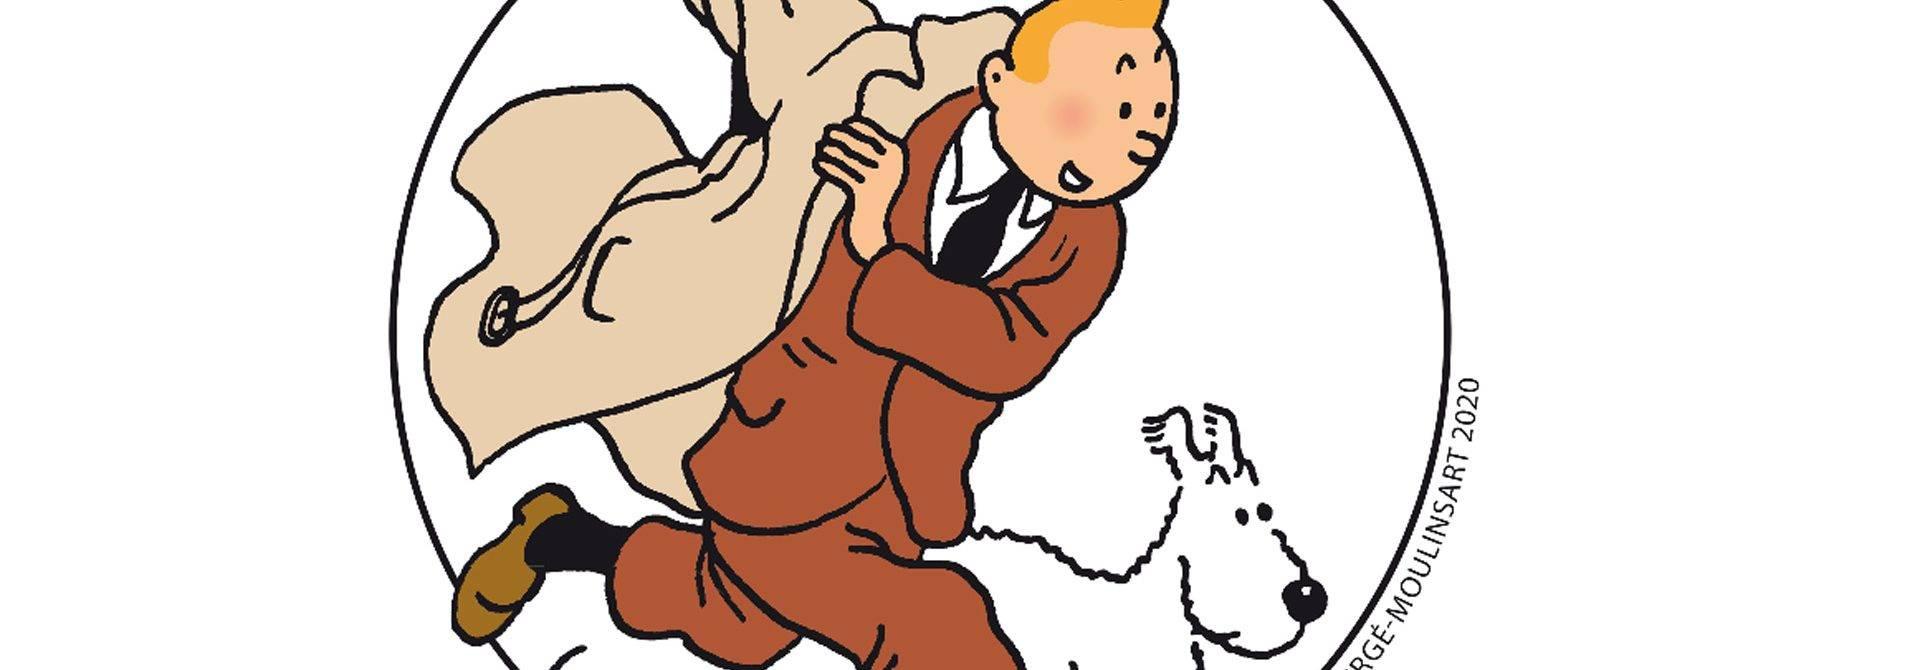 Microids Announces Tintin Video Game